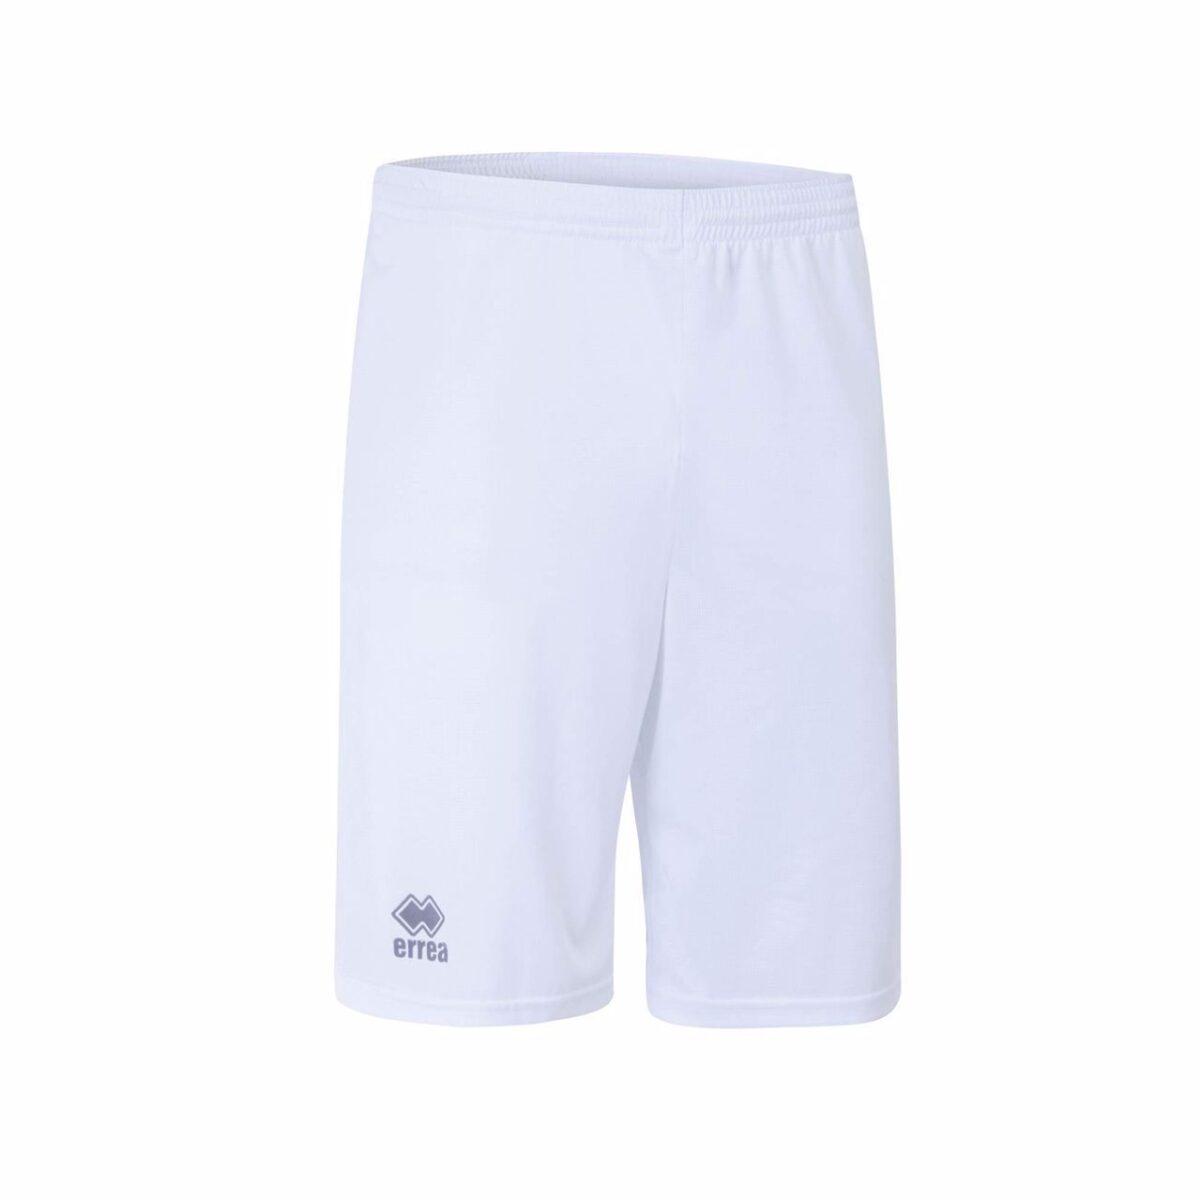 Errea Dallas 3.0 Basketball Junior Shorts - FP711Z